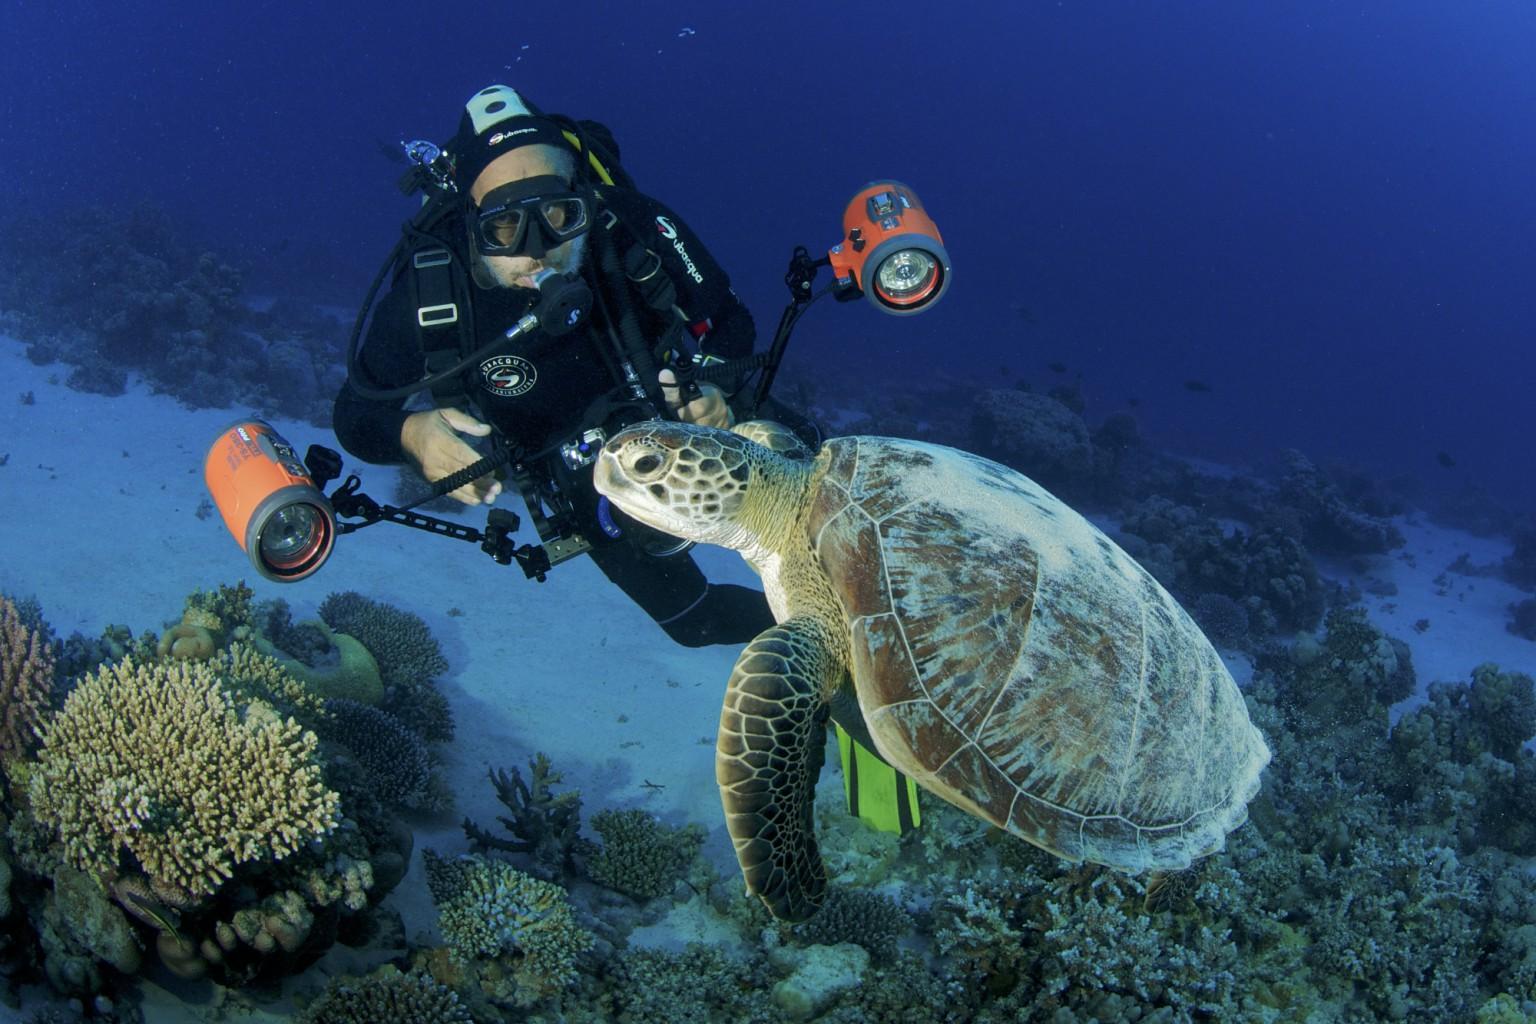 Sea Turtle & Underwater Photographer, Marsa Shagra Reef, Red Sea, Egypt